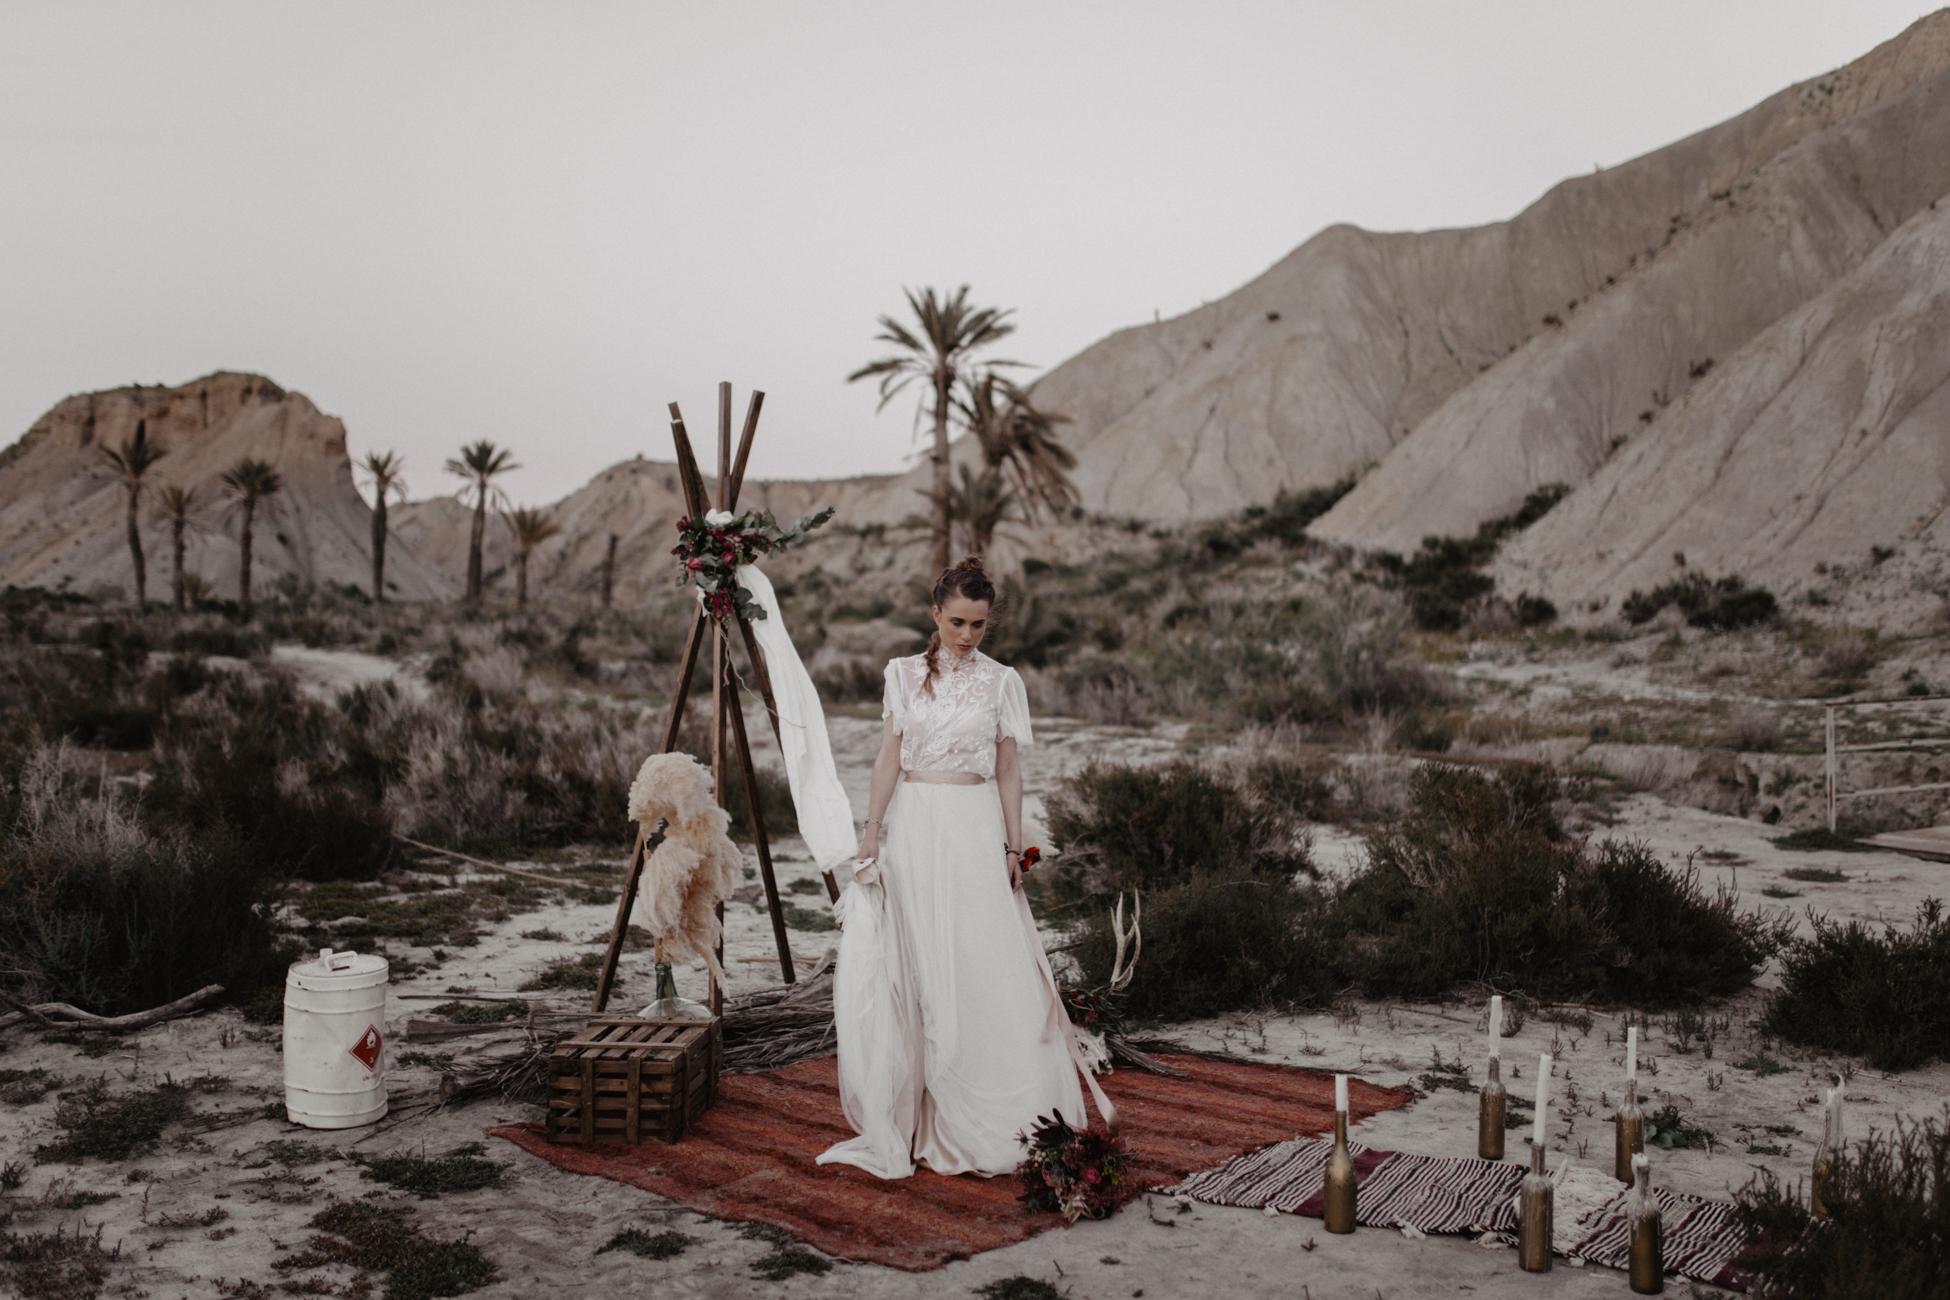 thenortherngirlphotography_photography_thenortherngirl_rebeccascabros_wedding_weddingphotography_weddingphotographer_wood_muebles_deco_bodasdecaramelo_home_bedtime_gaywedding_editorial_desierto_desert_wildestdreams_amortexano-449.jpg